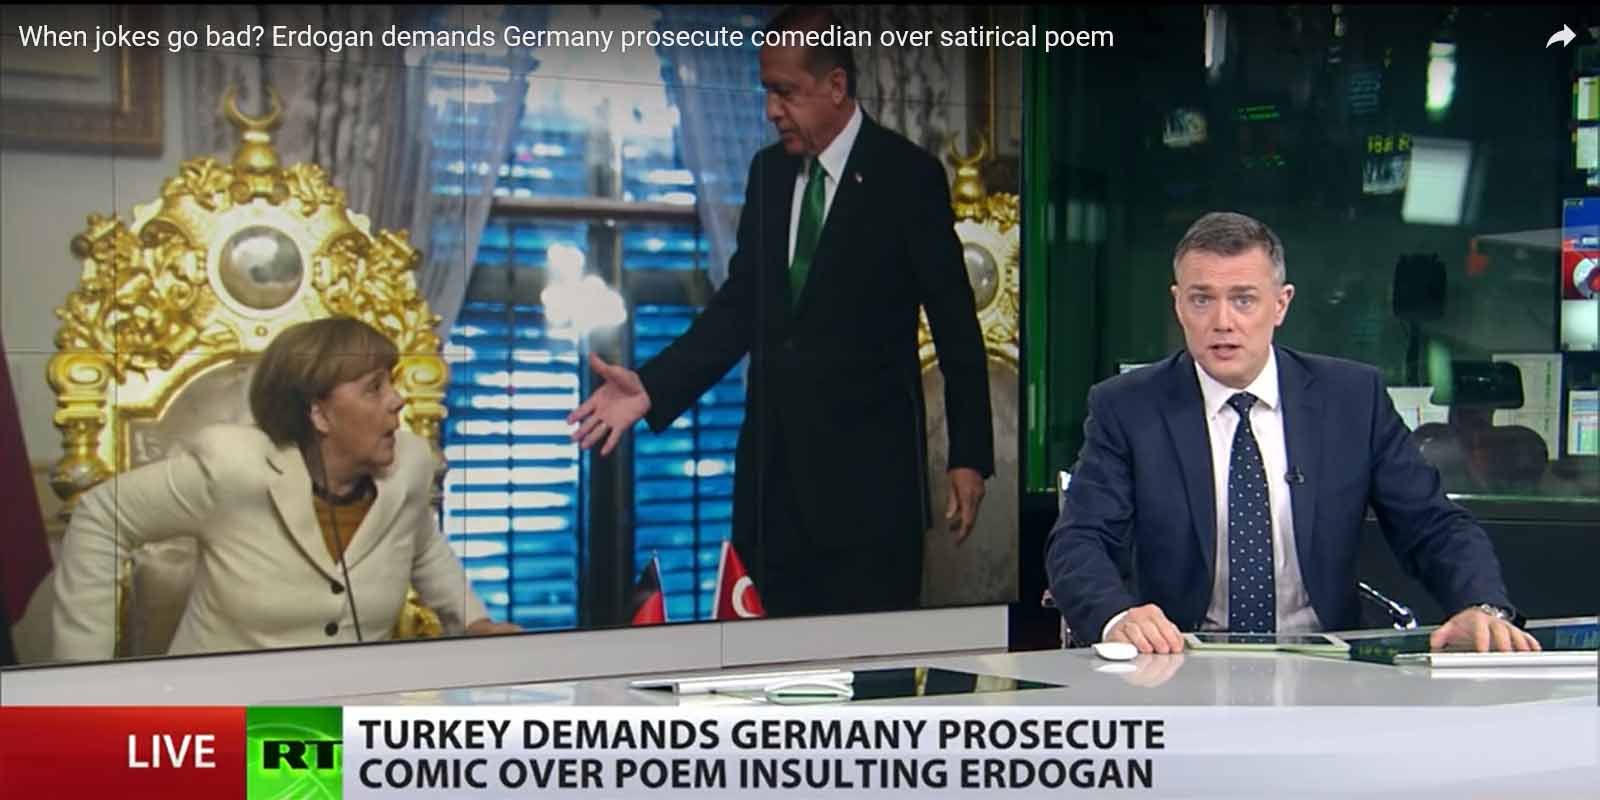 When jokes go bad? Erdogan demands Germany prosecute comedian over satirical poem